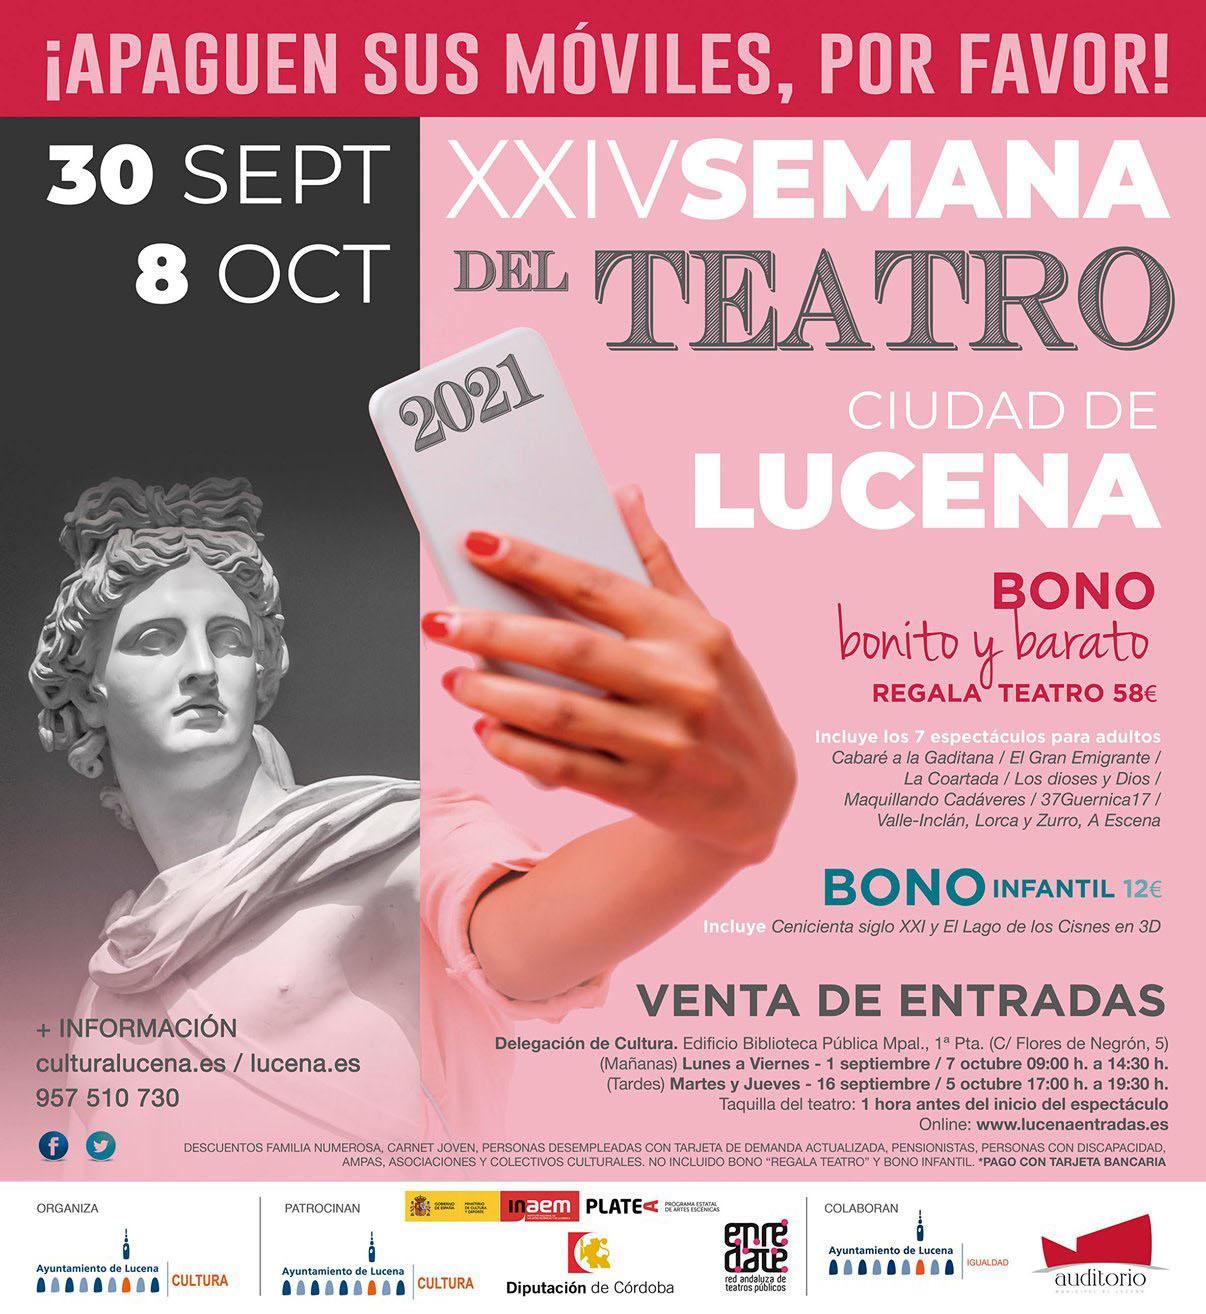 XXIV SEMANA DEL TEATRO @ Auditorio/Erisana